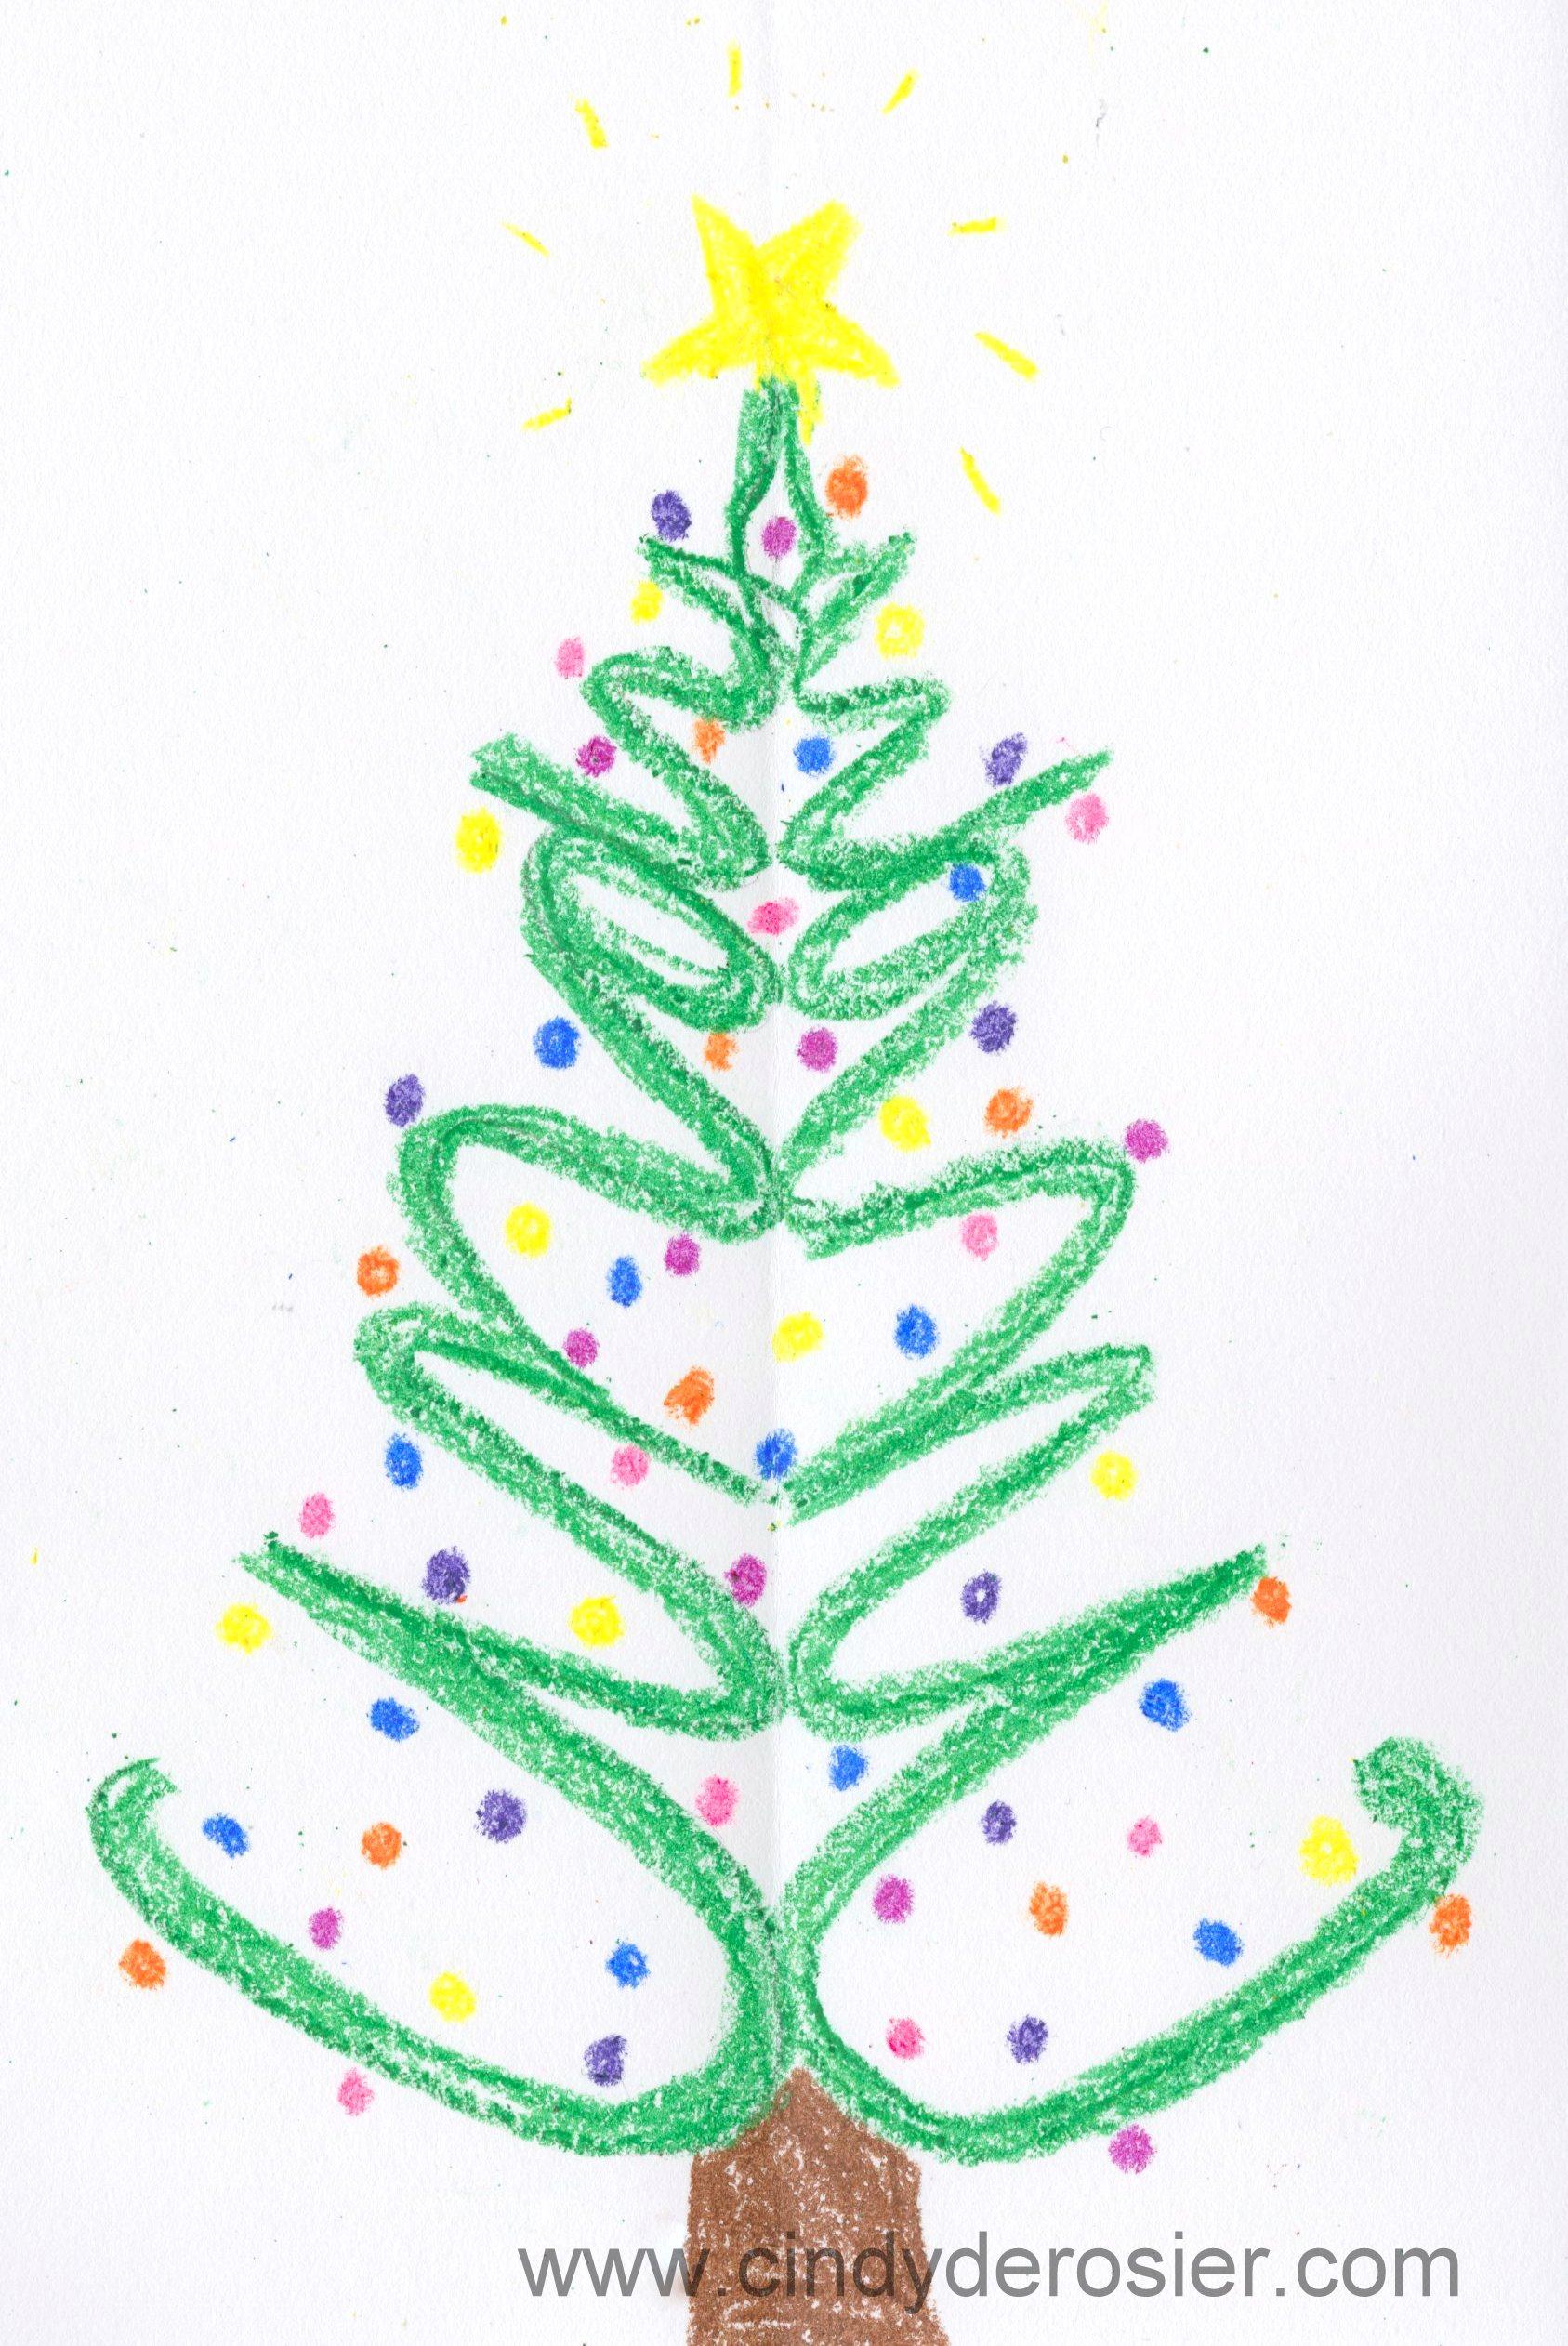 Christmas Crafts - Magazine cover